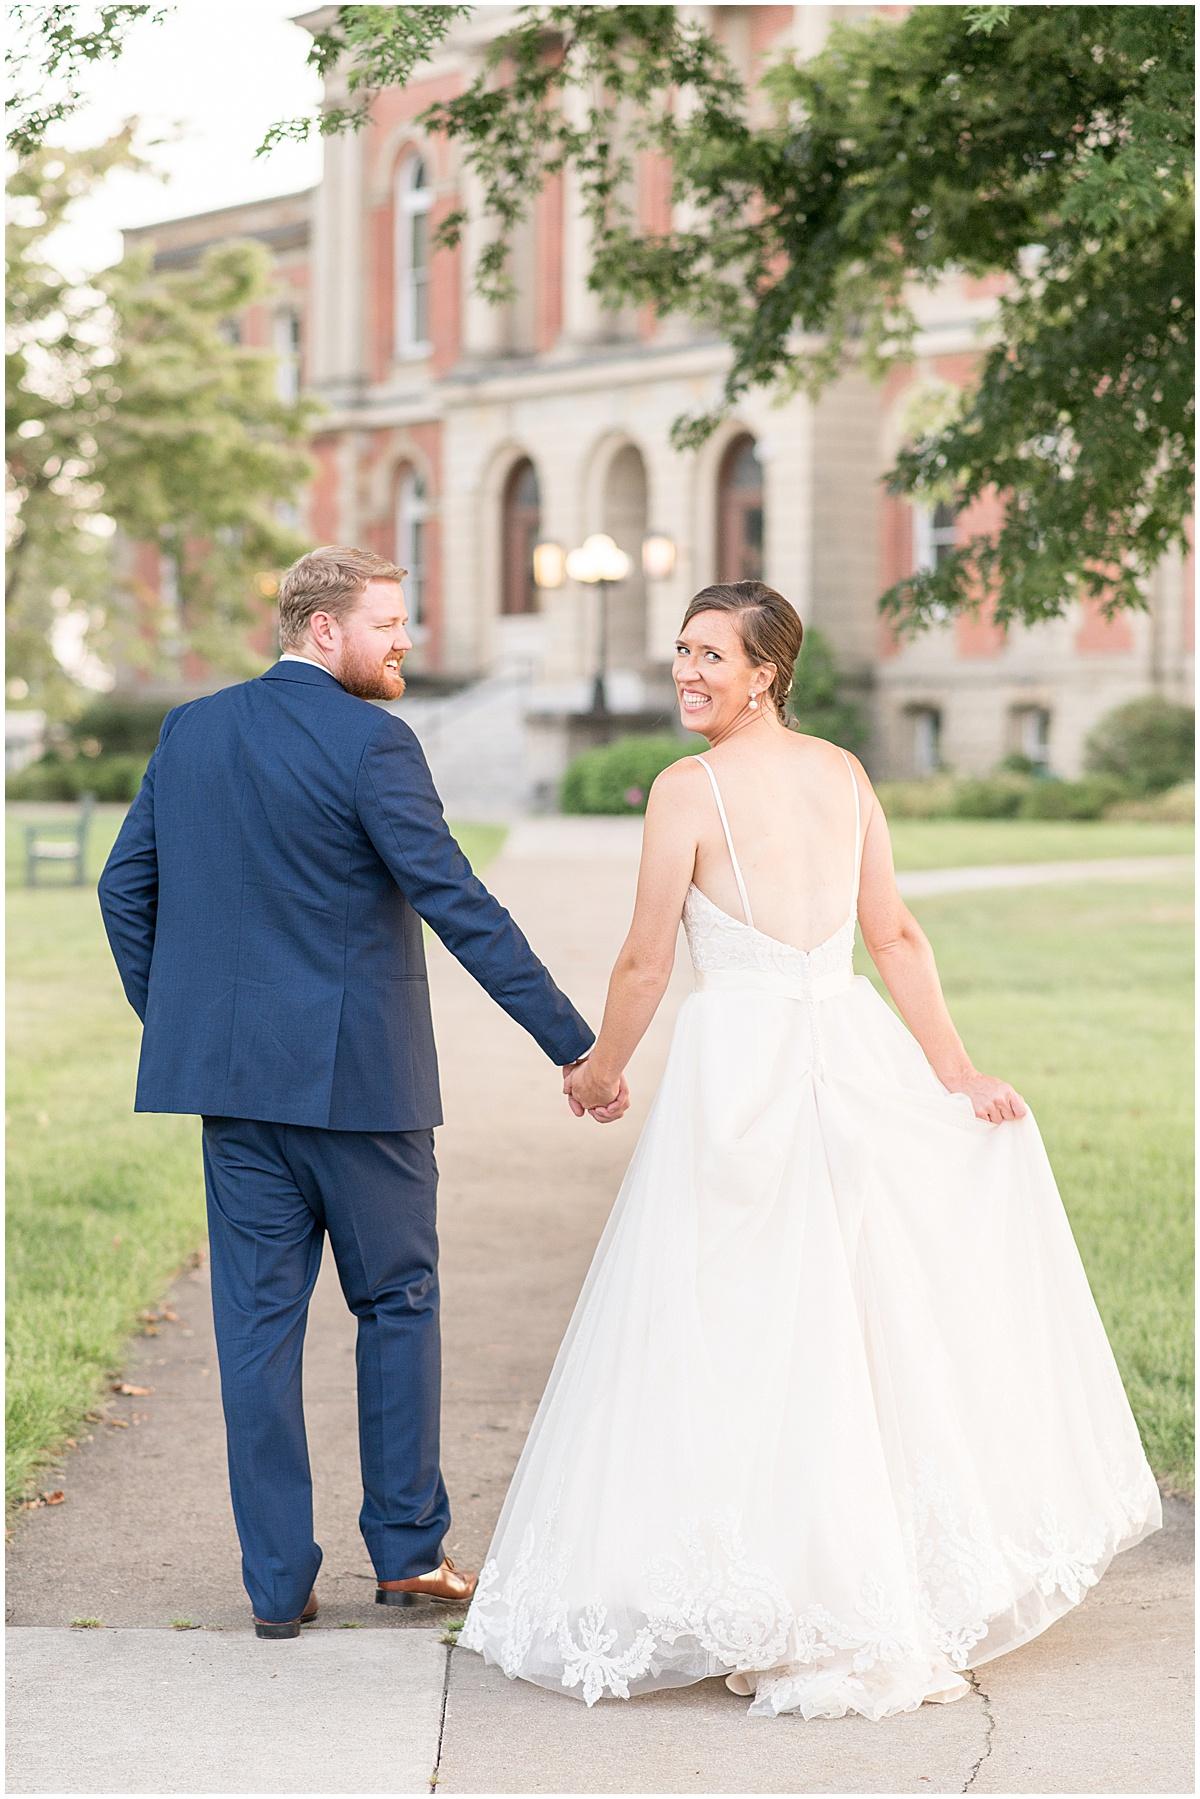 Bride and groom walking outside of Spohn Ballroom wedding in Goshen, Indiana